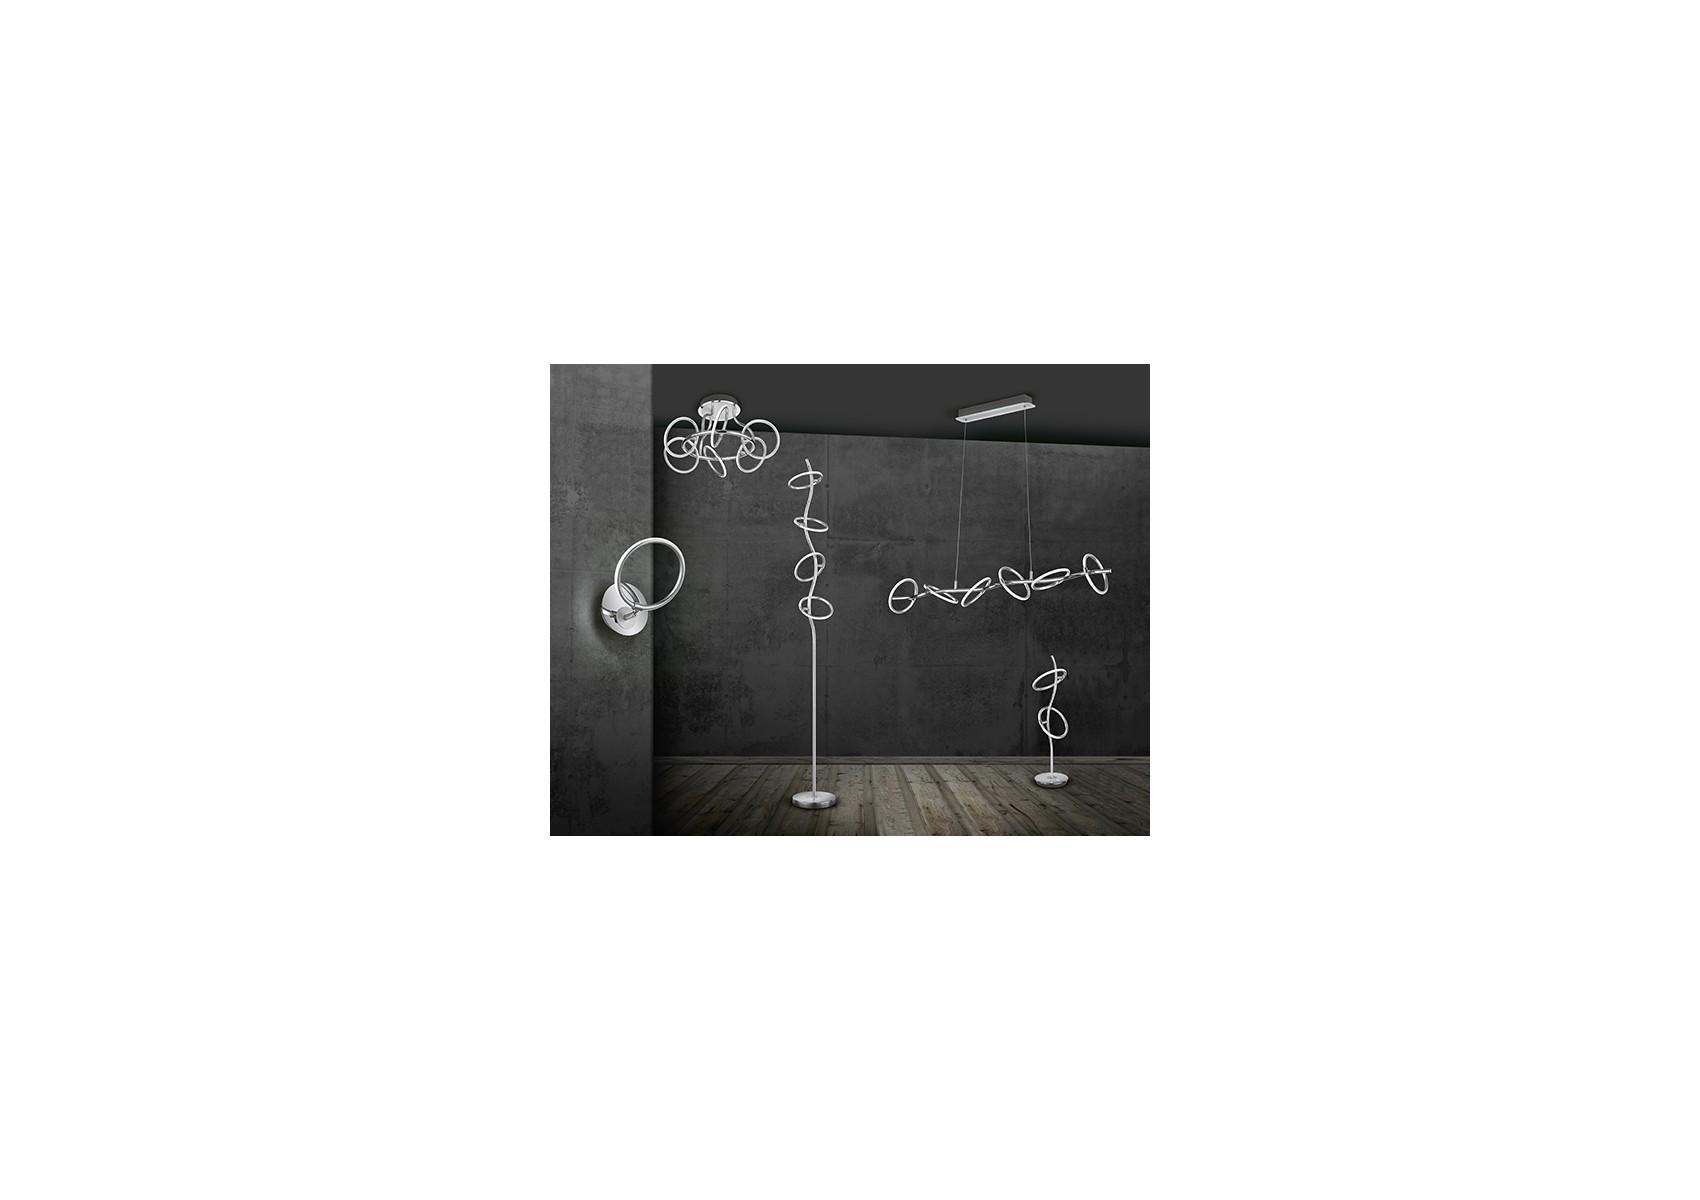 lampadaire design led de la collection olympus de chez trio. Black Bedroom Furniture Sets. Home Design Ideas